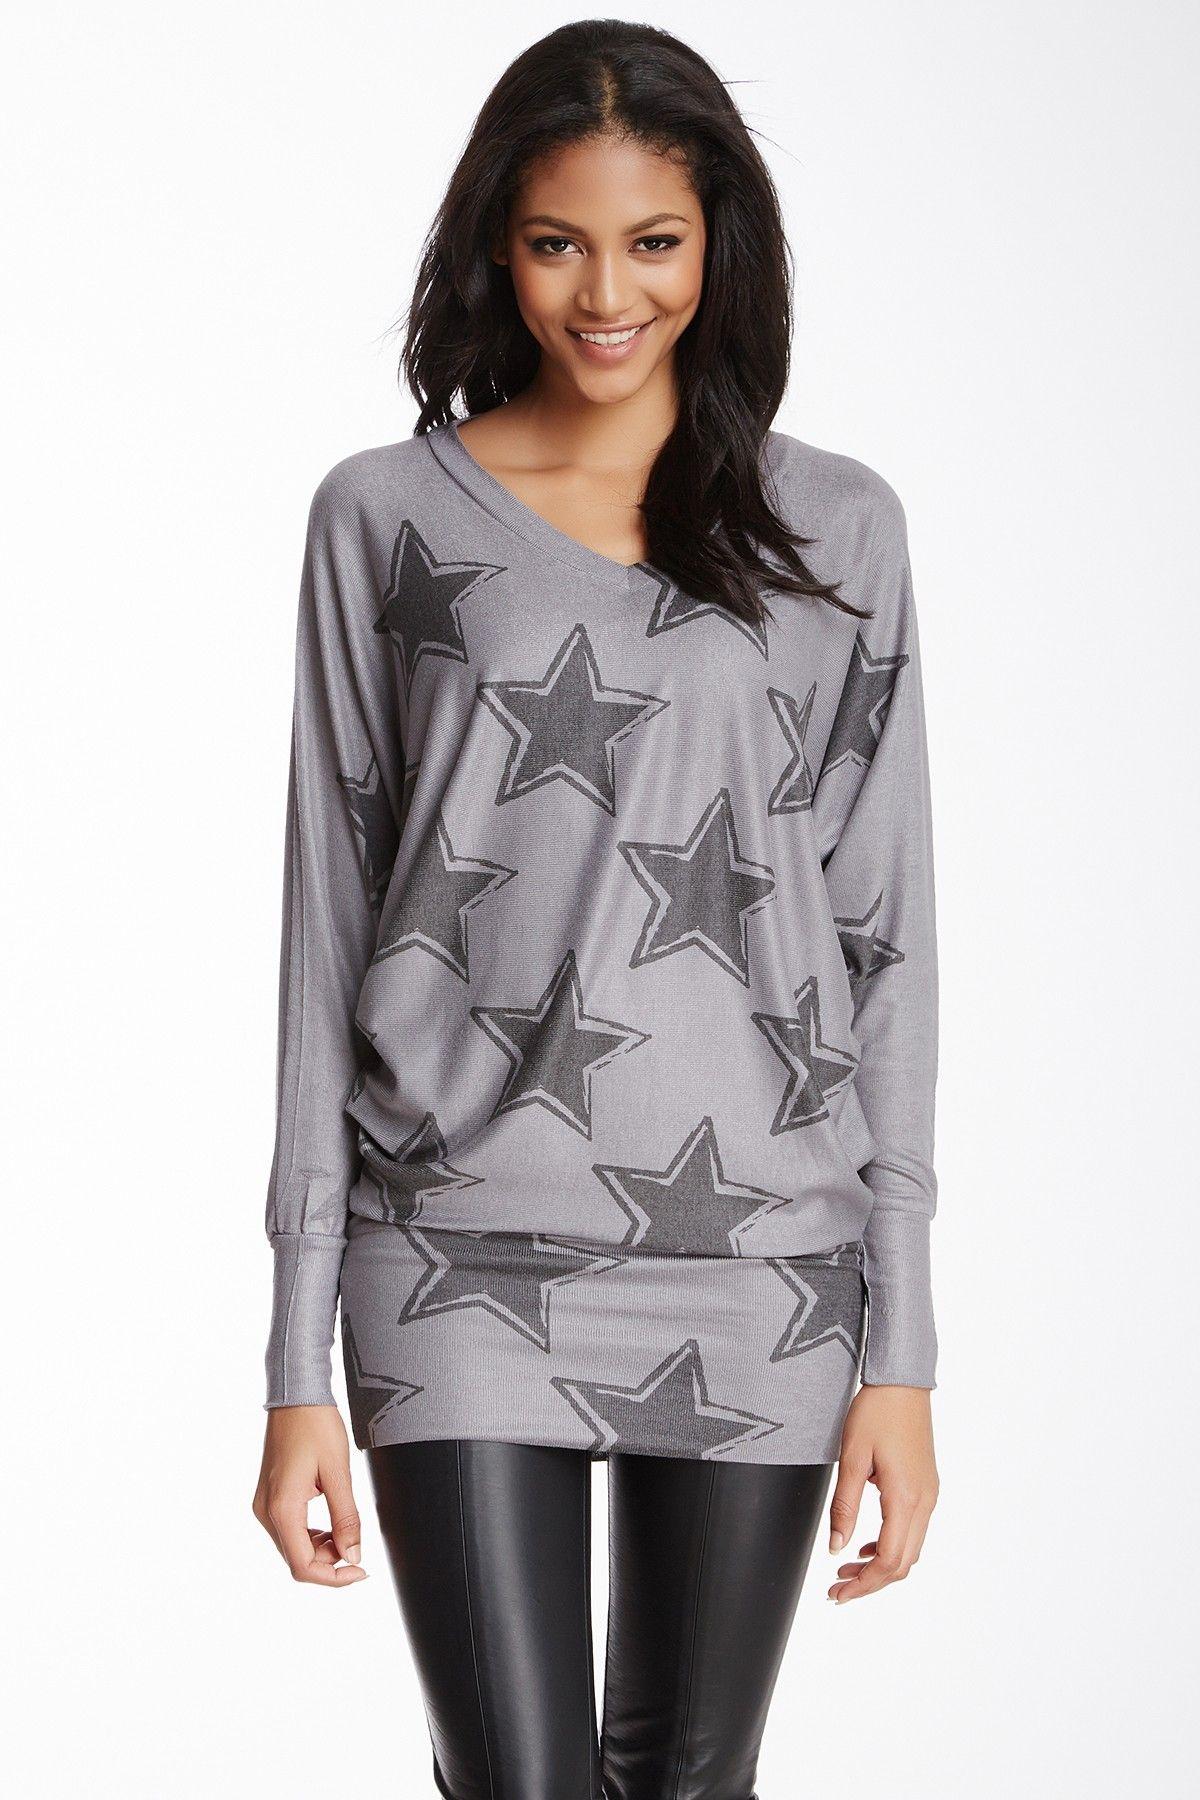 Go Couture V-Neck Tunic Sweater - Black Stars | My walk-in closet ...